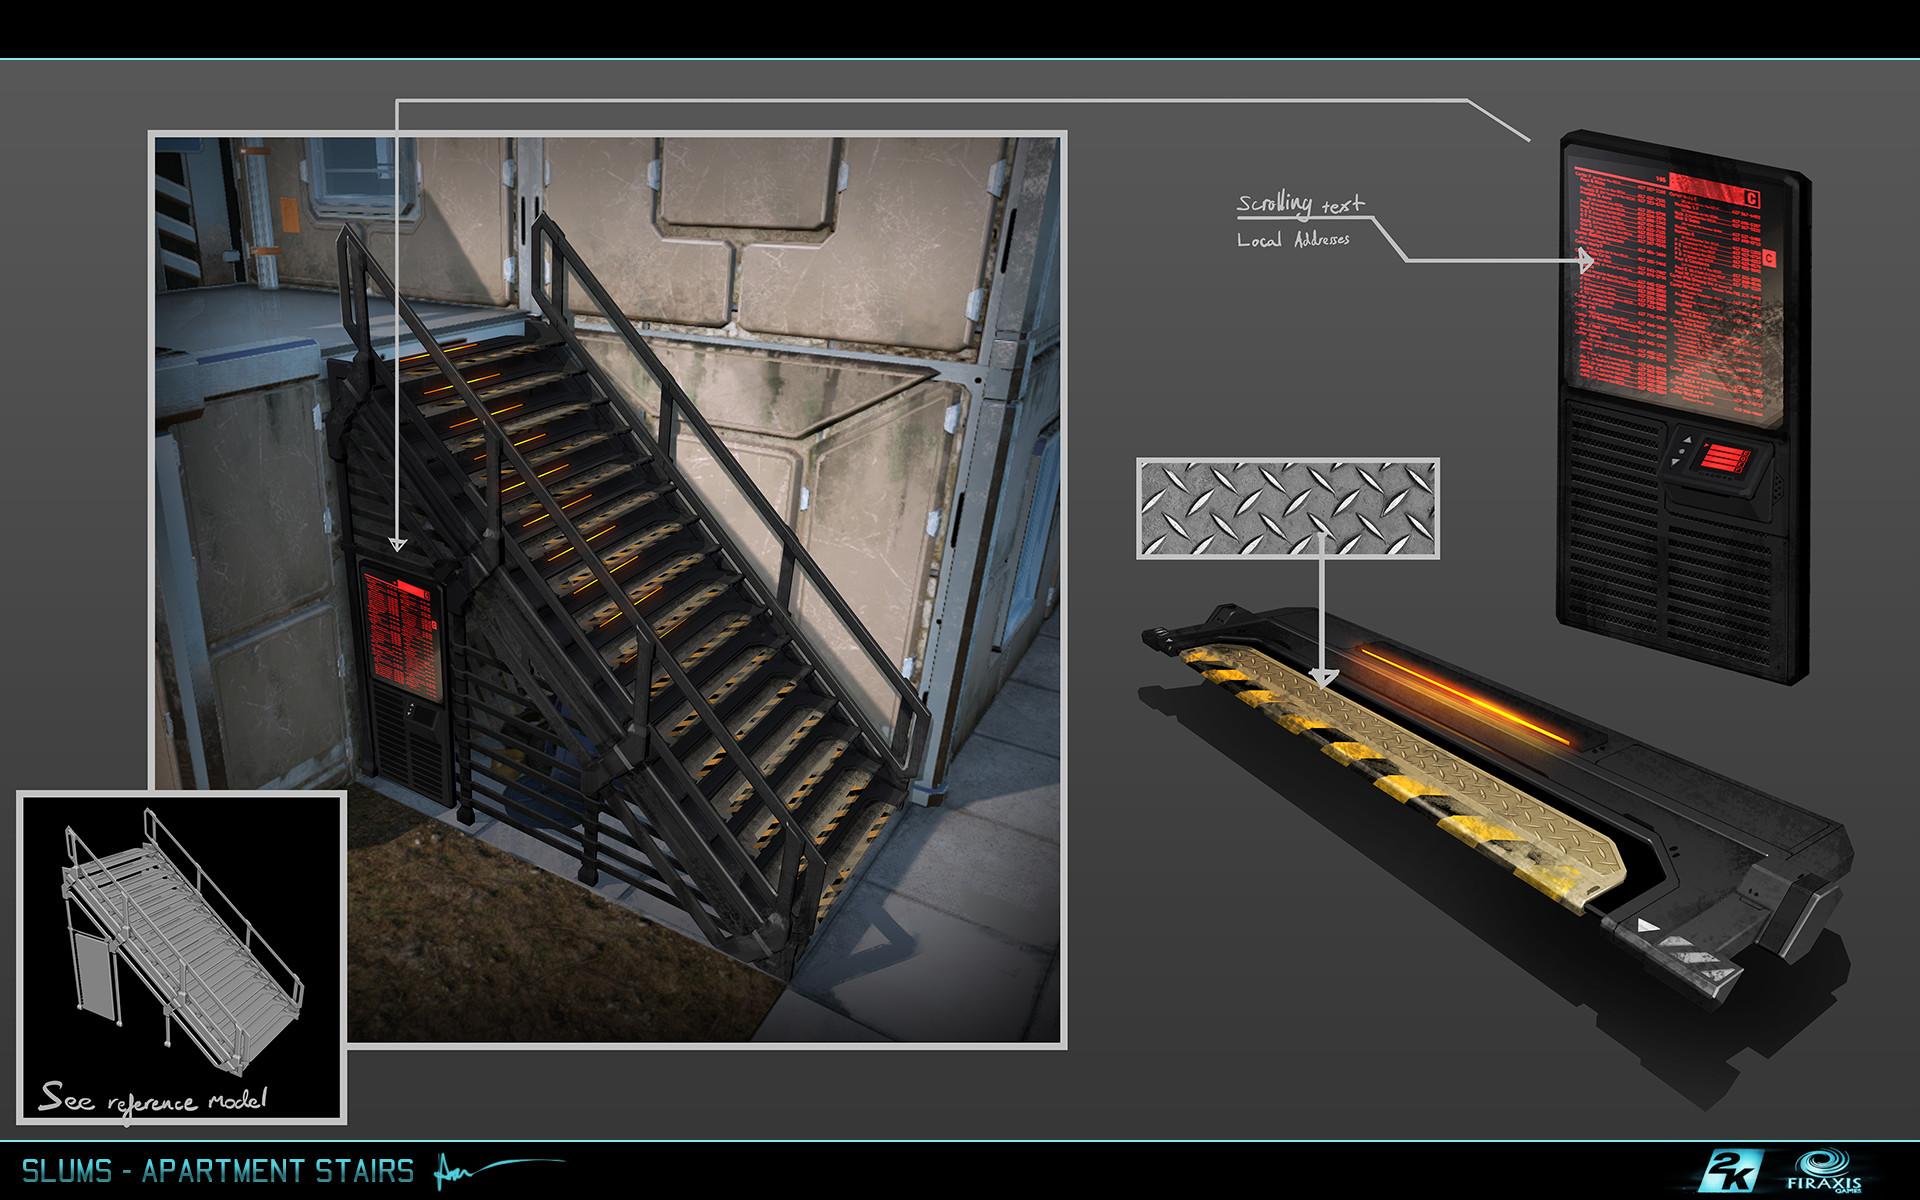 Samuel aaron whitehead slums apartment stairs